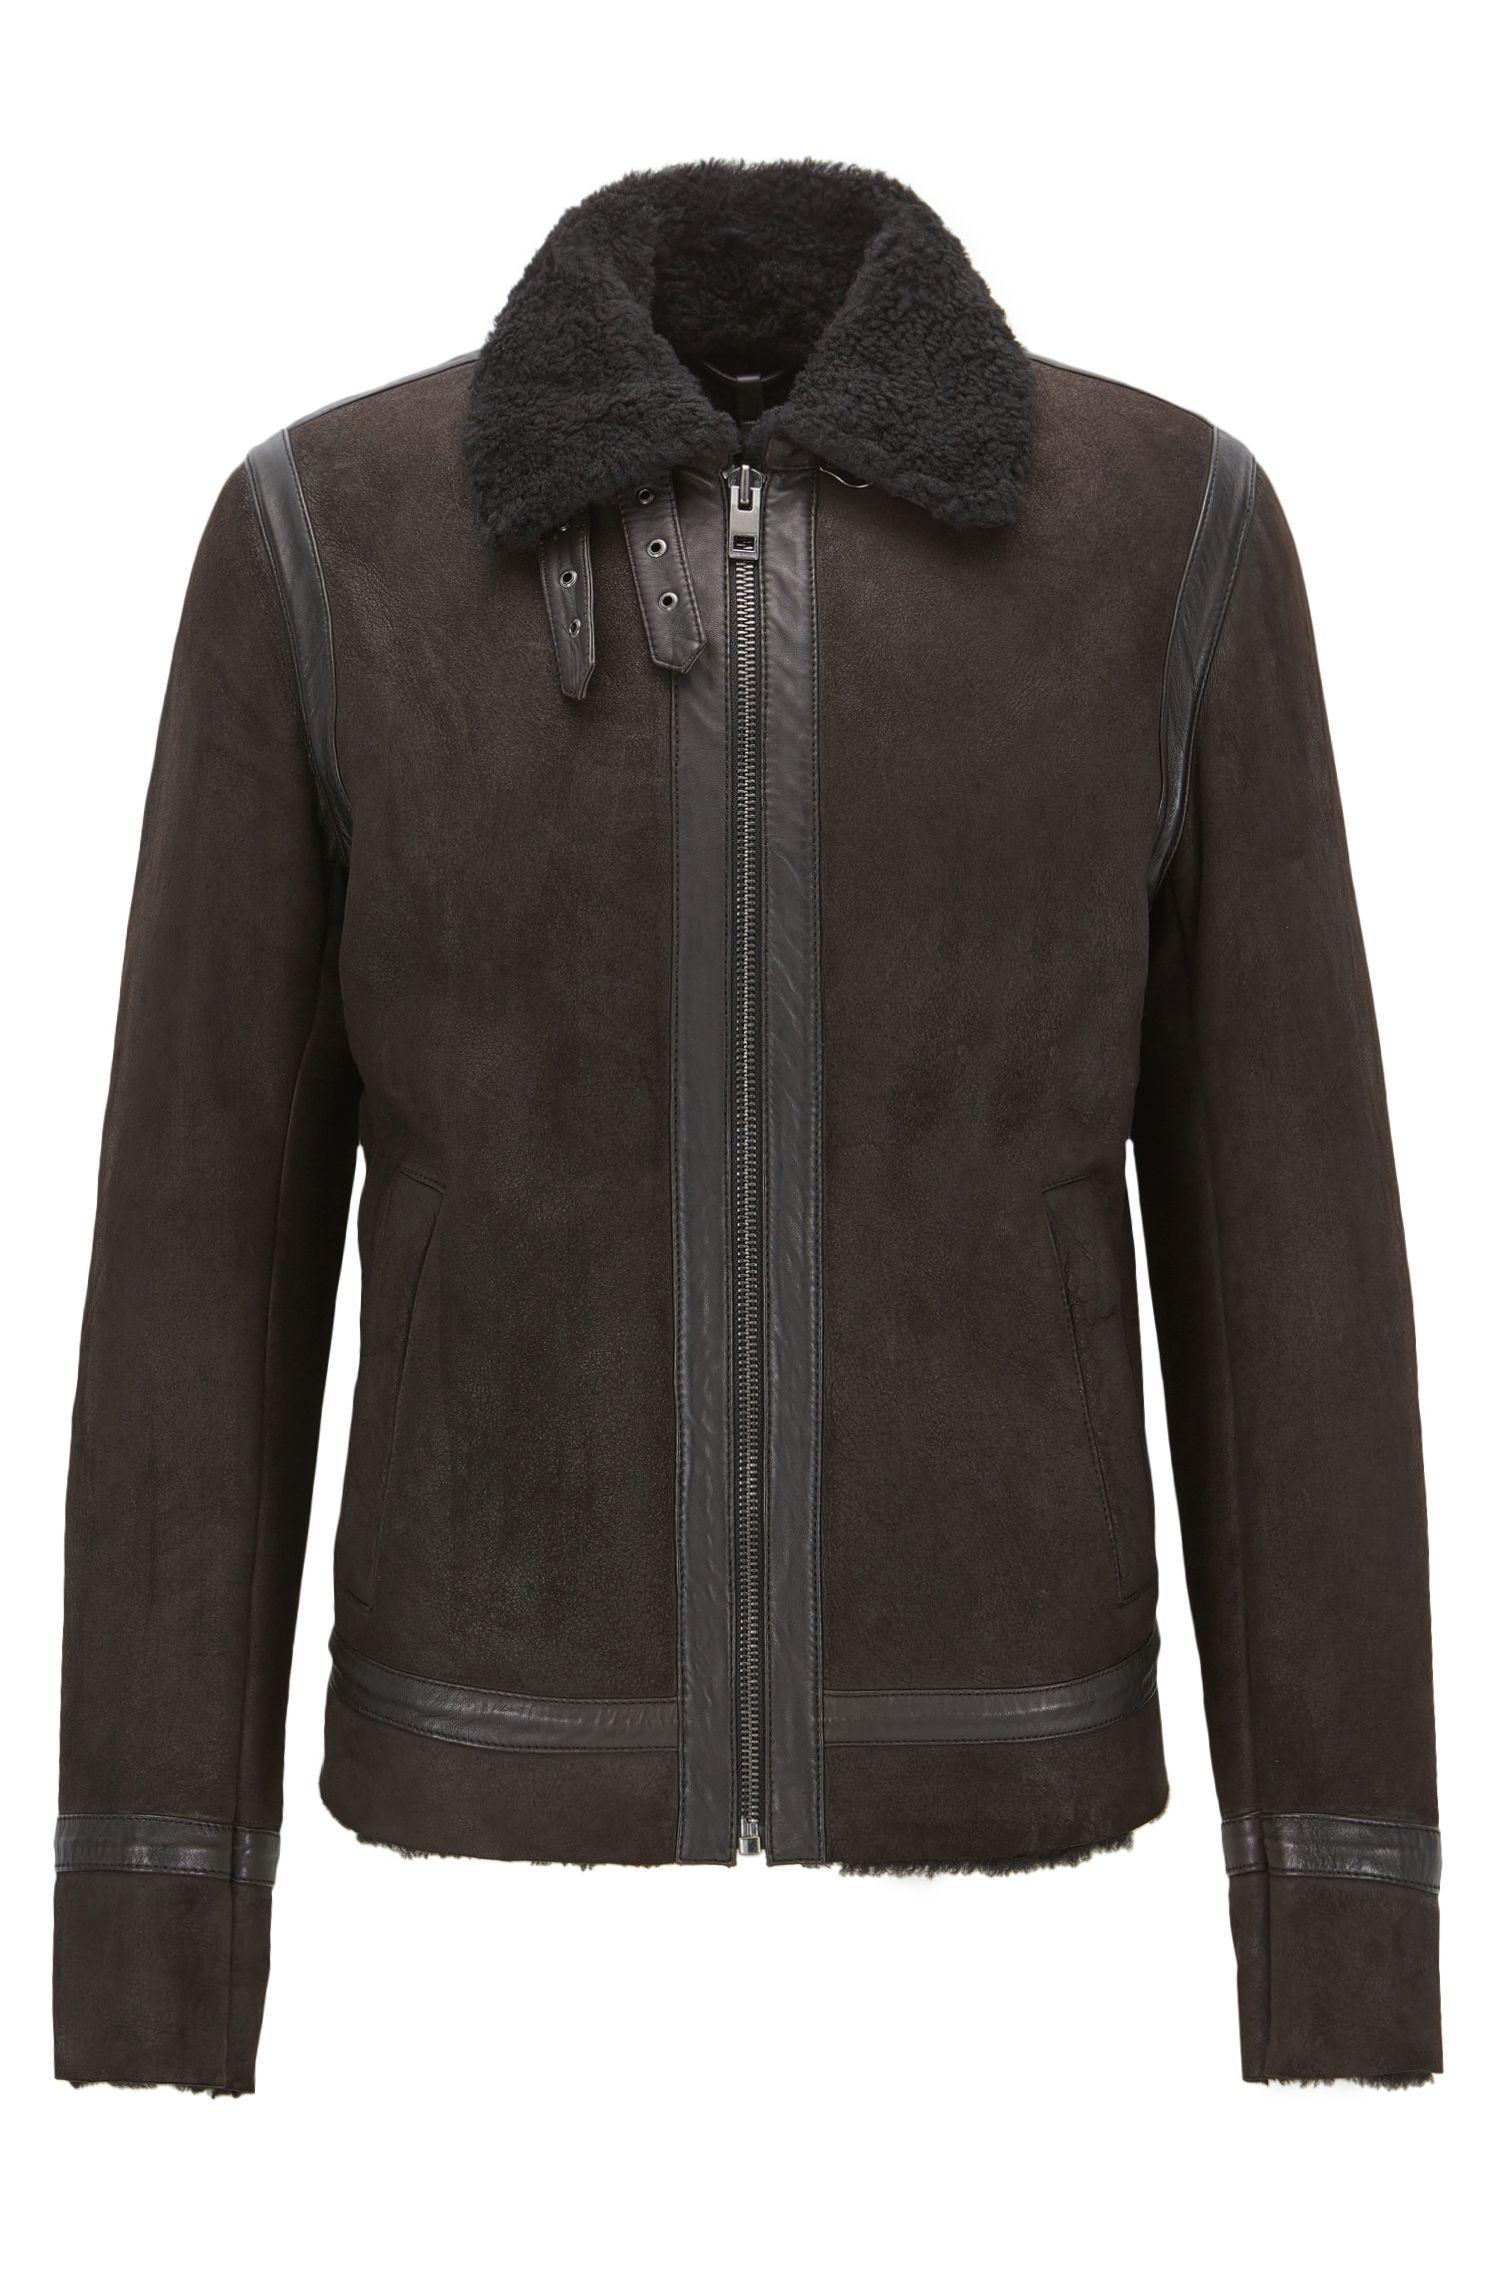 Shearling Suede Jacket | Jearling